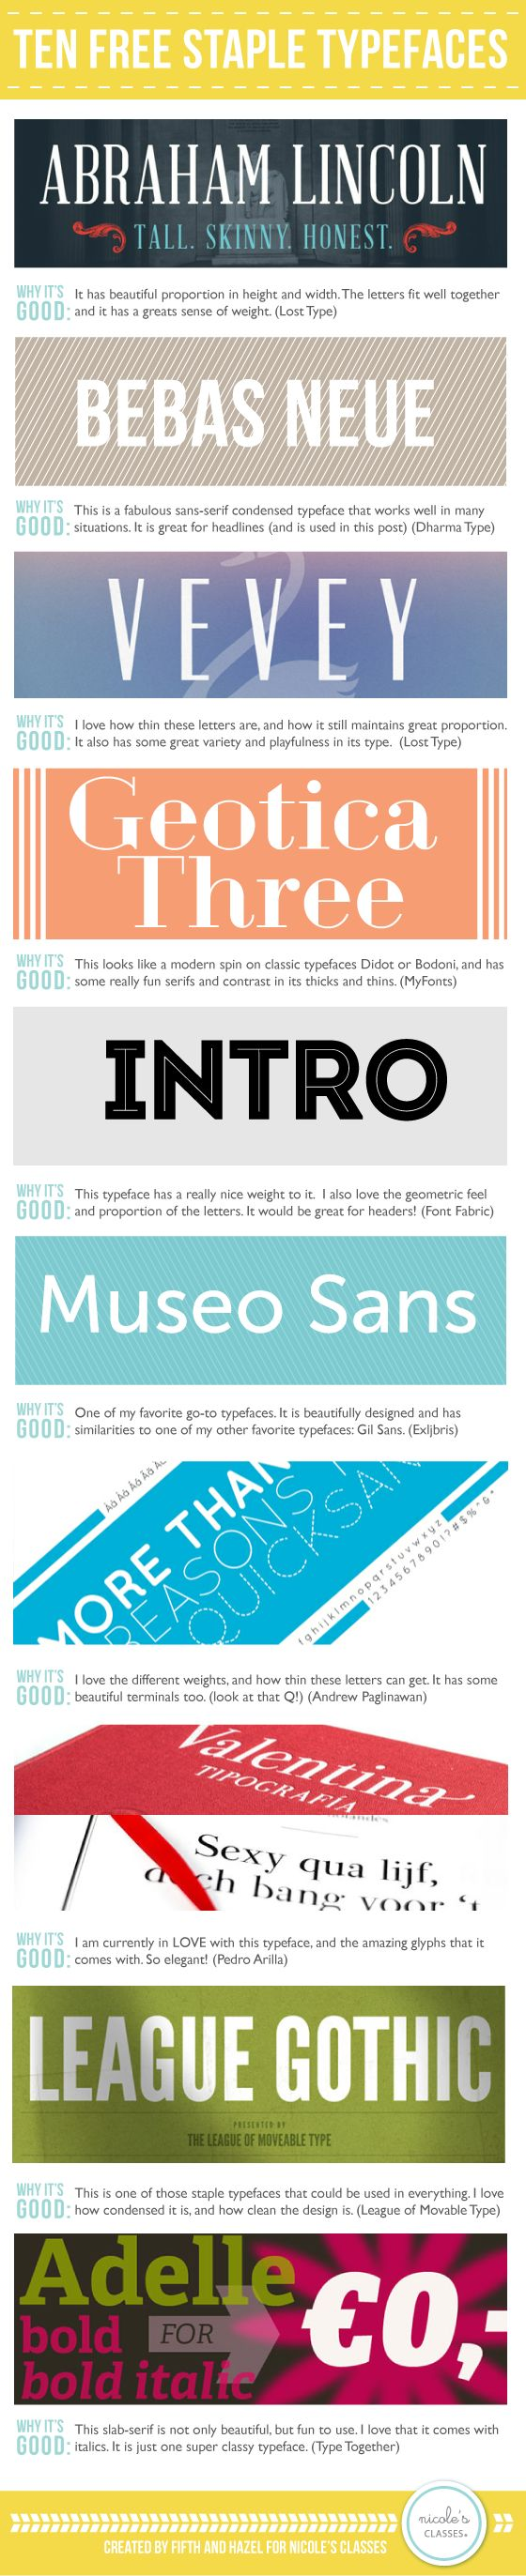 10 Free Staple Typefaces (Fonts) | | Nicoles ClassesNicoles Classes